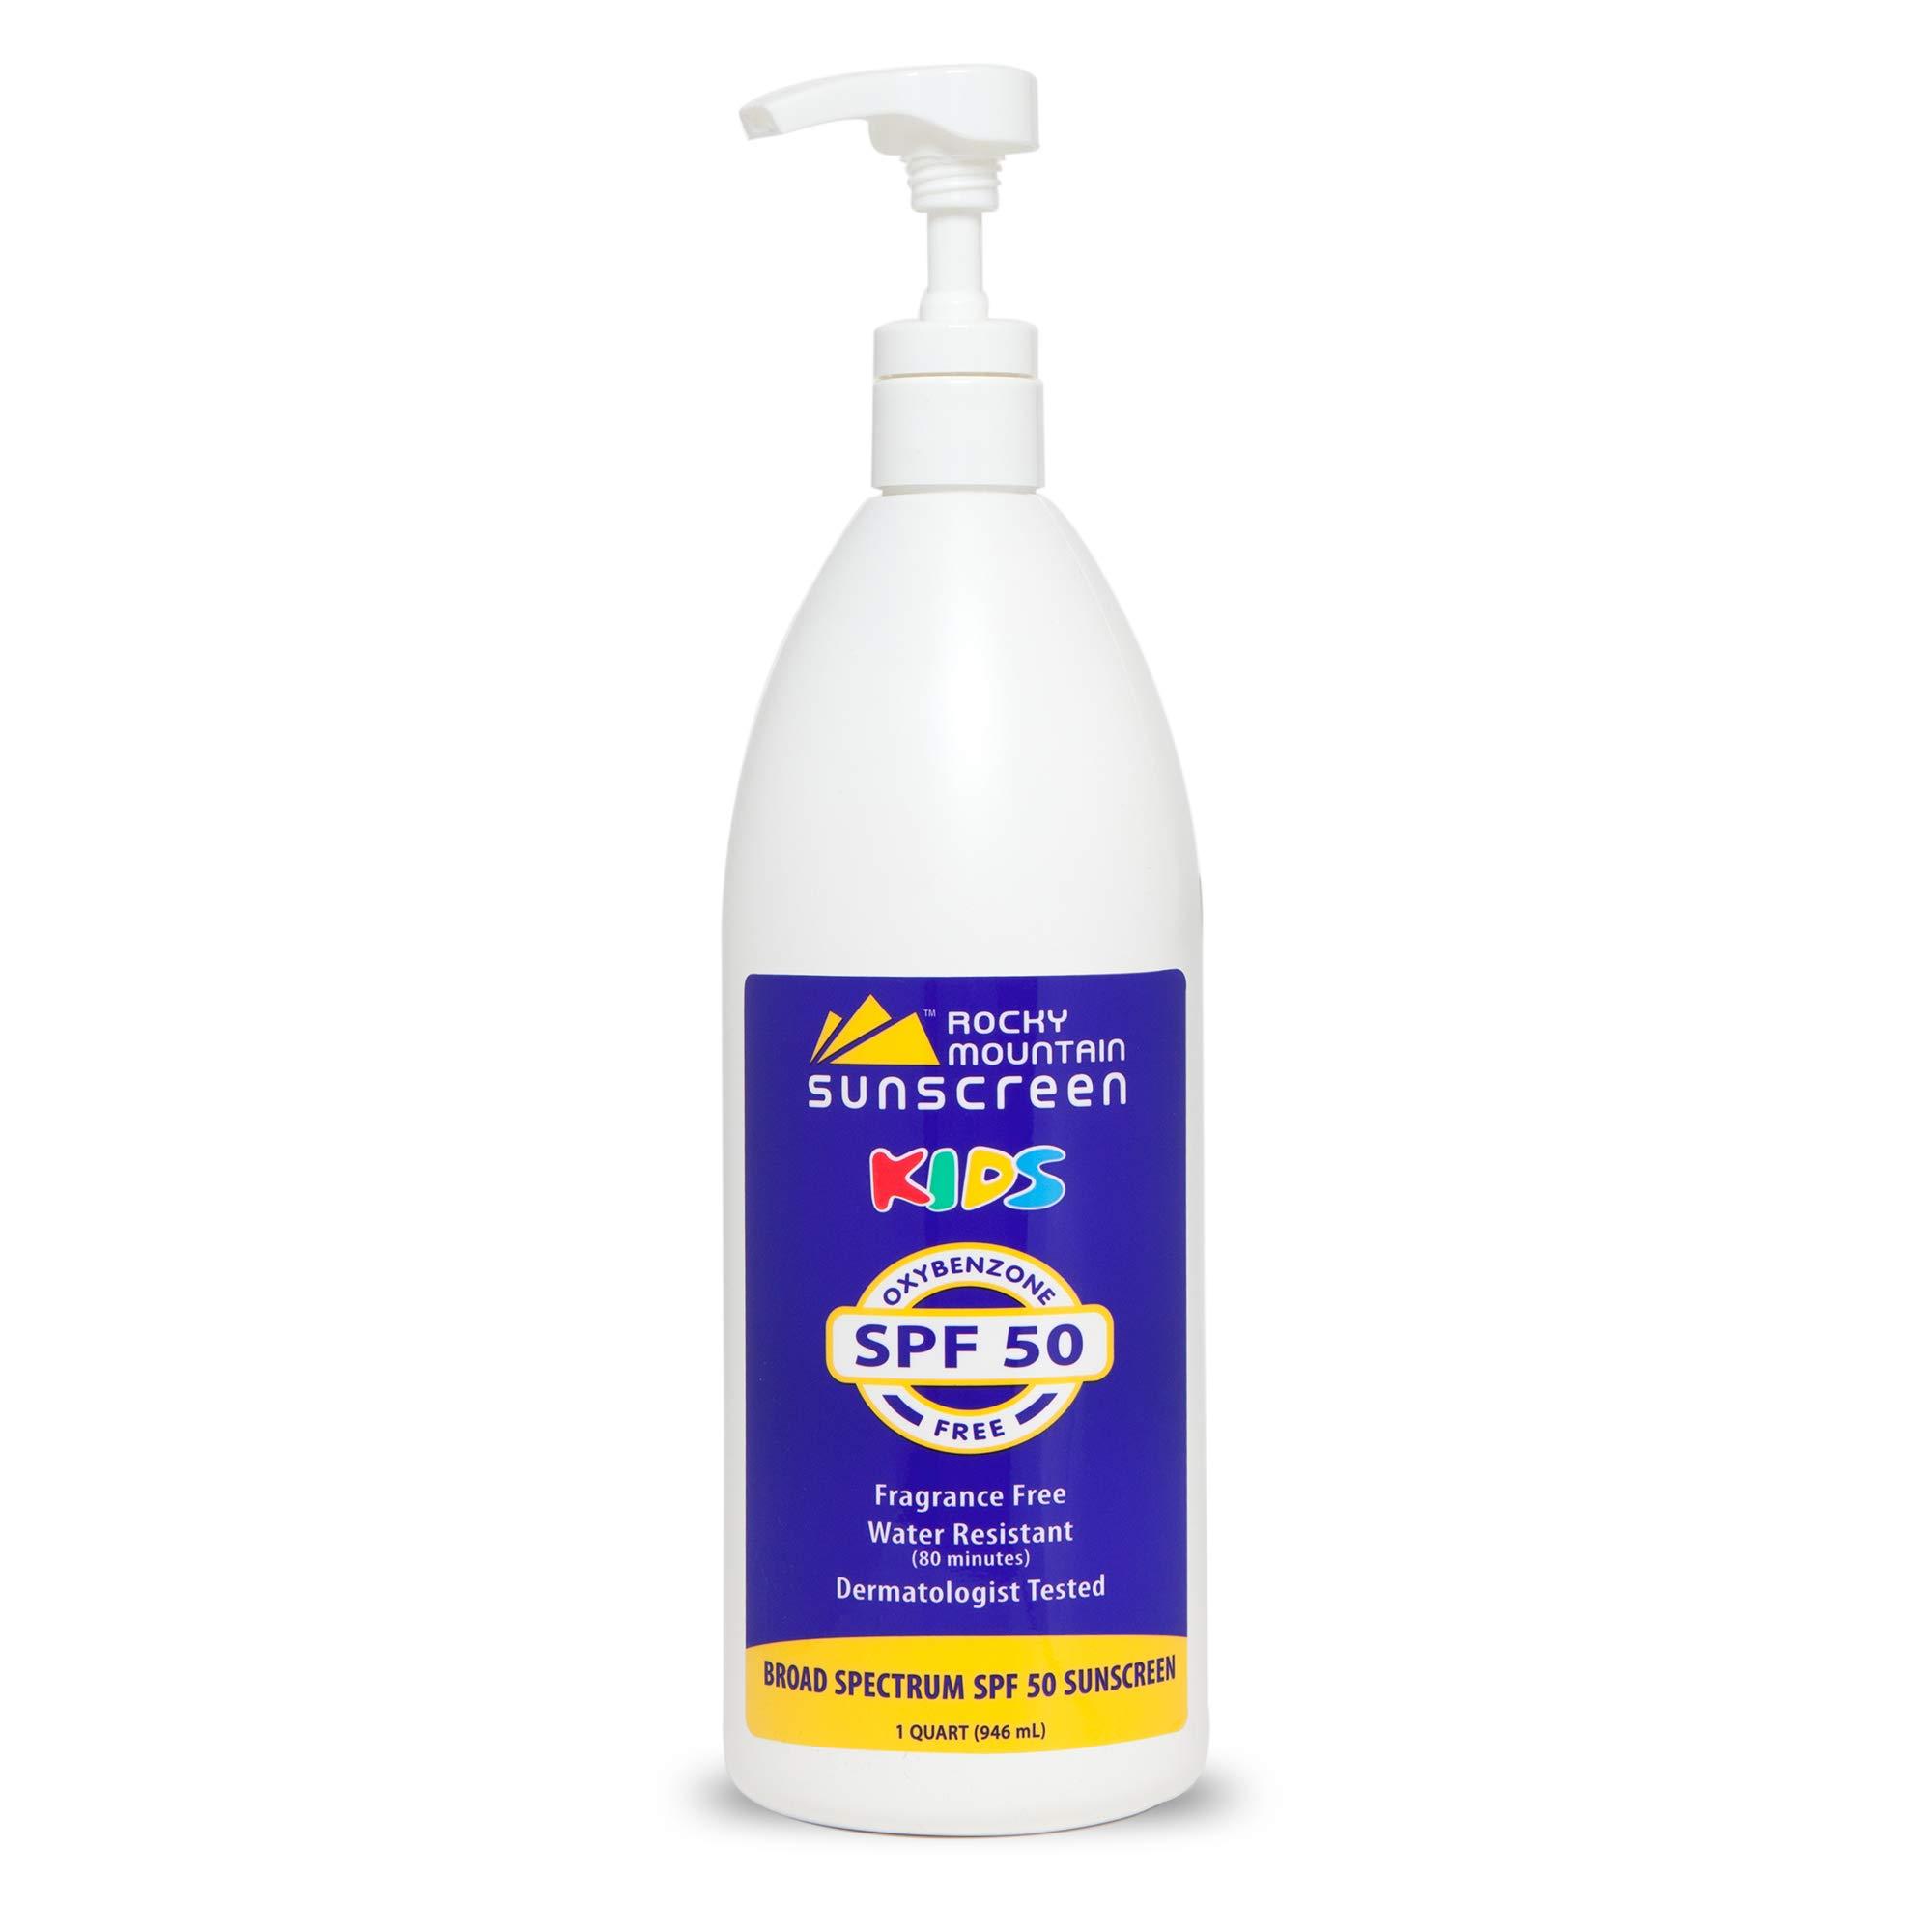 Rocky Mountain Sunscreen - Kids, Quart, SPF 50 Lotion - Oxybenzone Free, No Octinoxate, Reef Friendly, Hypoallergenic, Water Resistant 80 Min, Gluten Free, Bulk